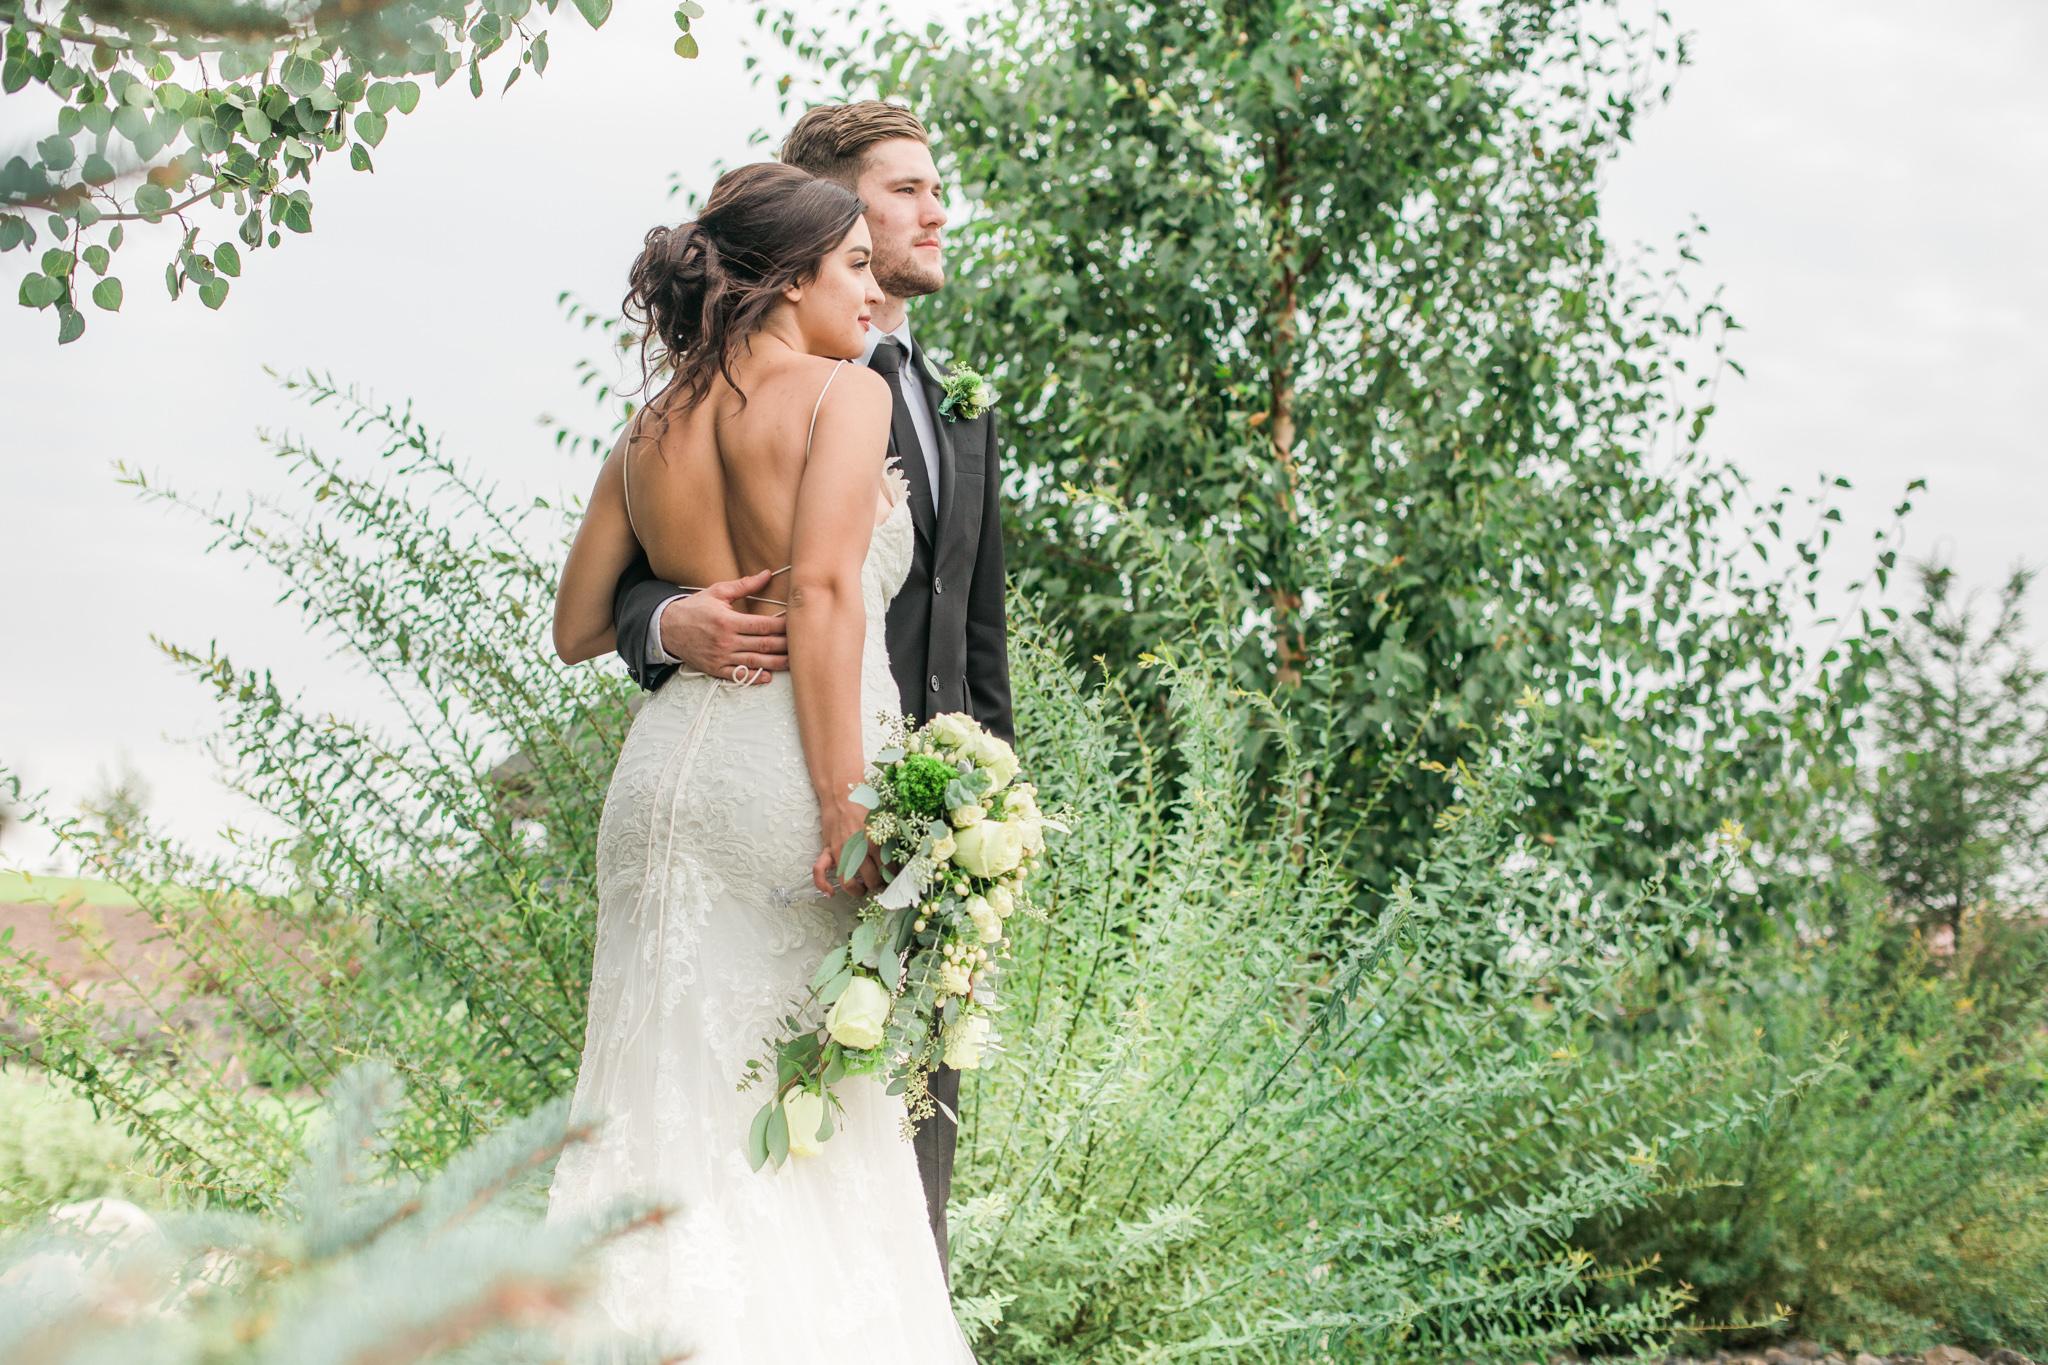 Olga_janni_wedding_090917_WEBSIZE (491 of 704).JPG